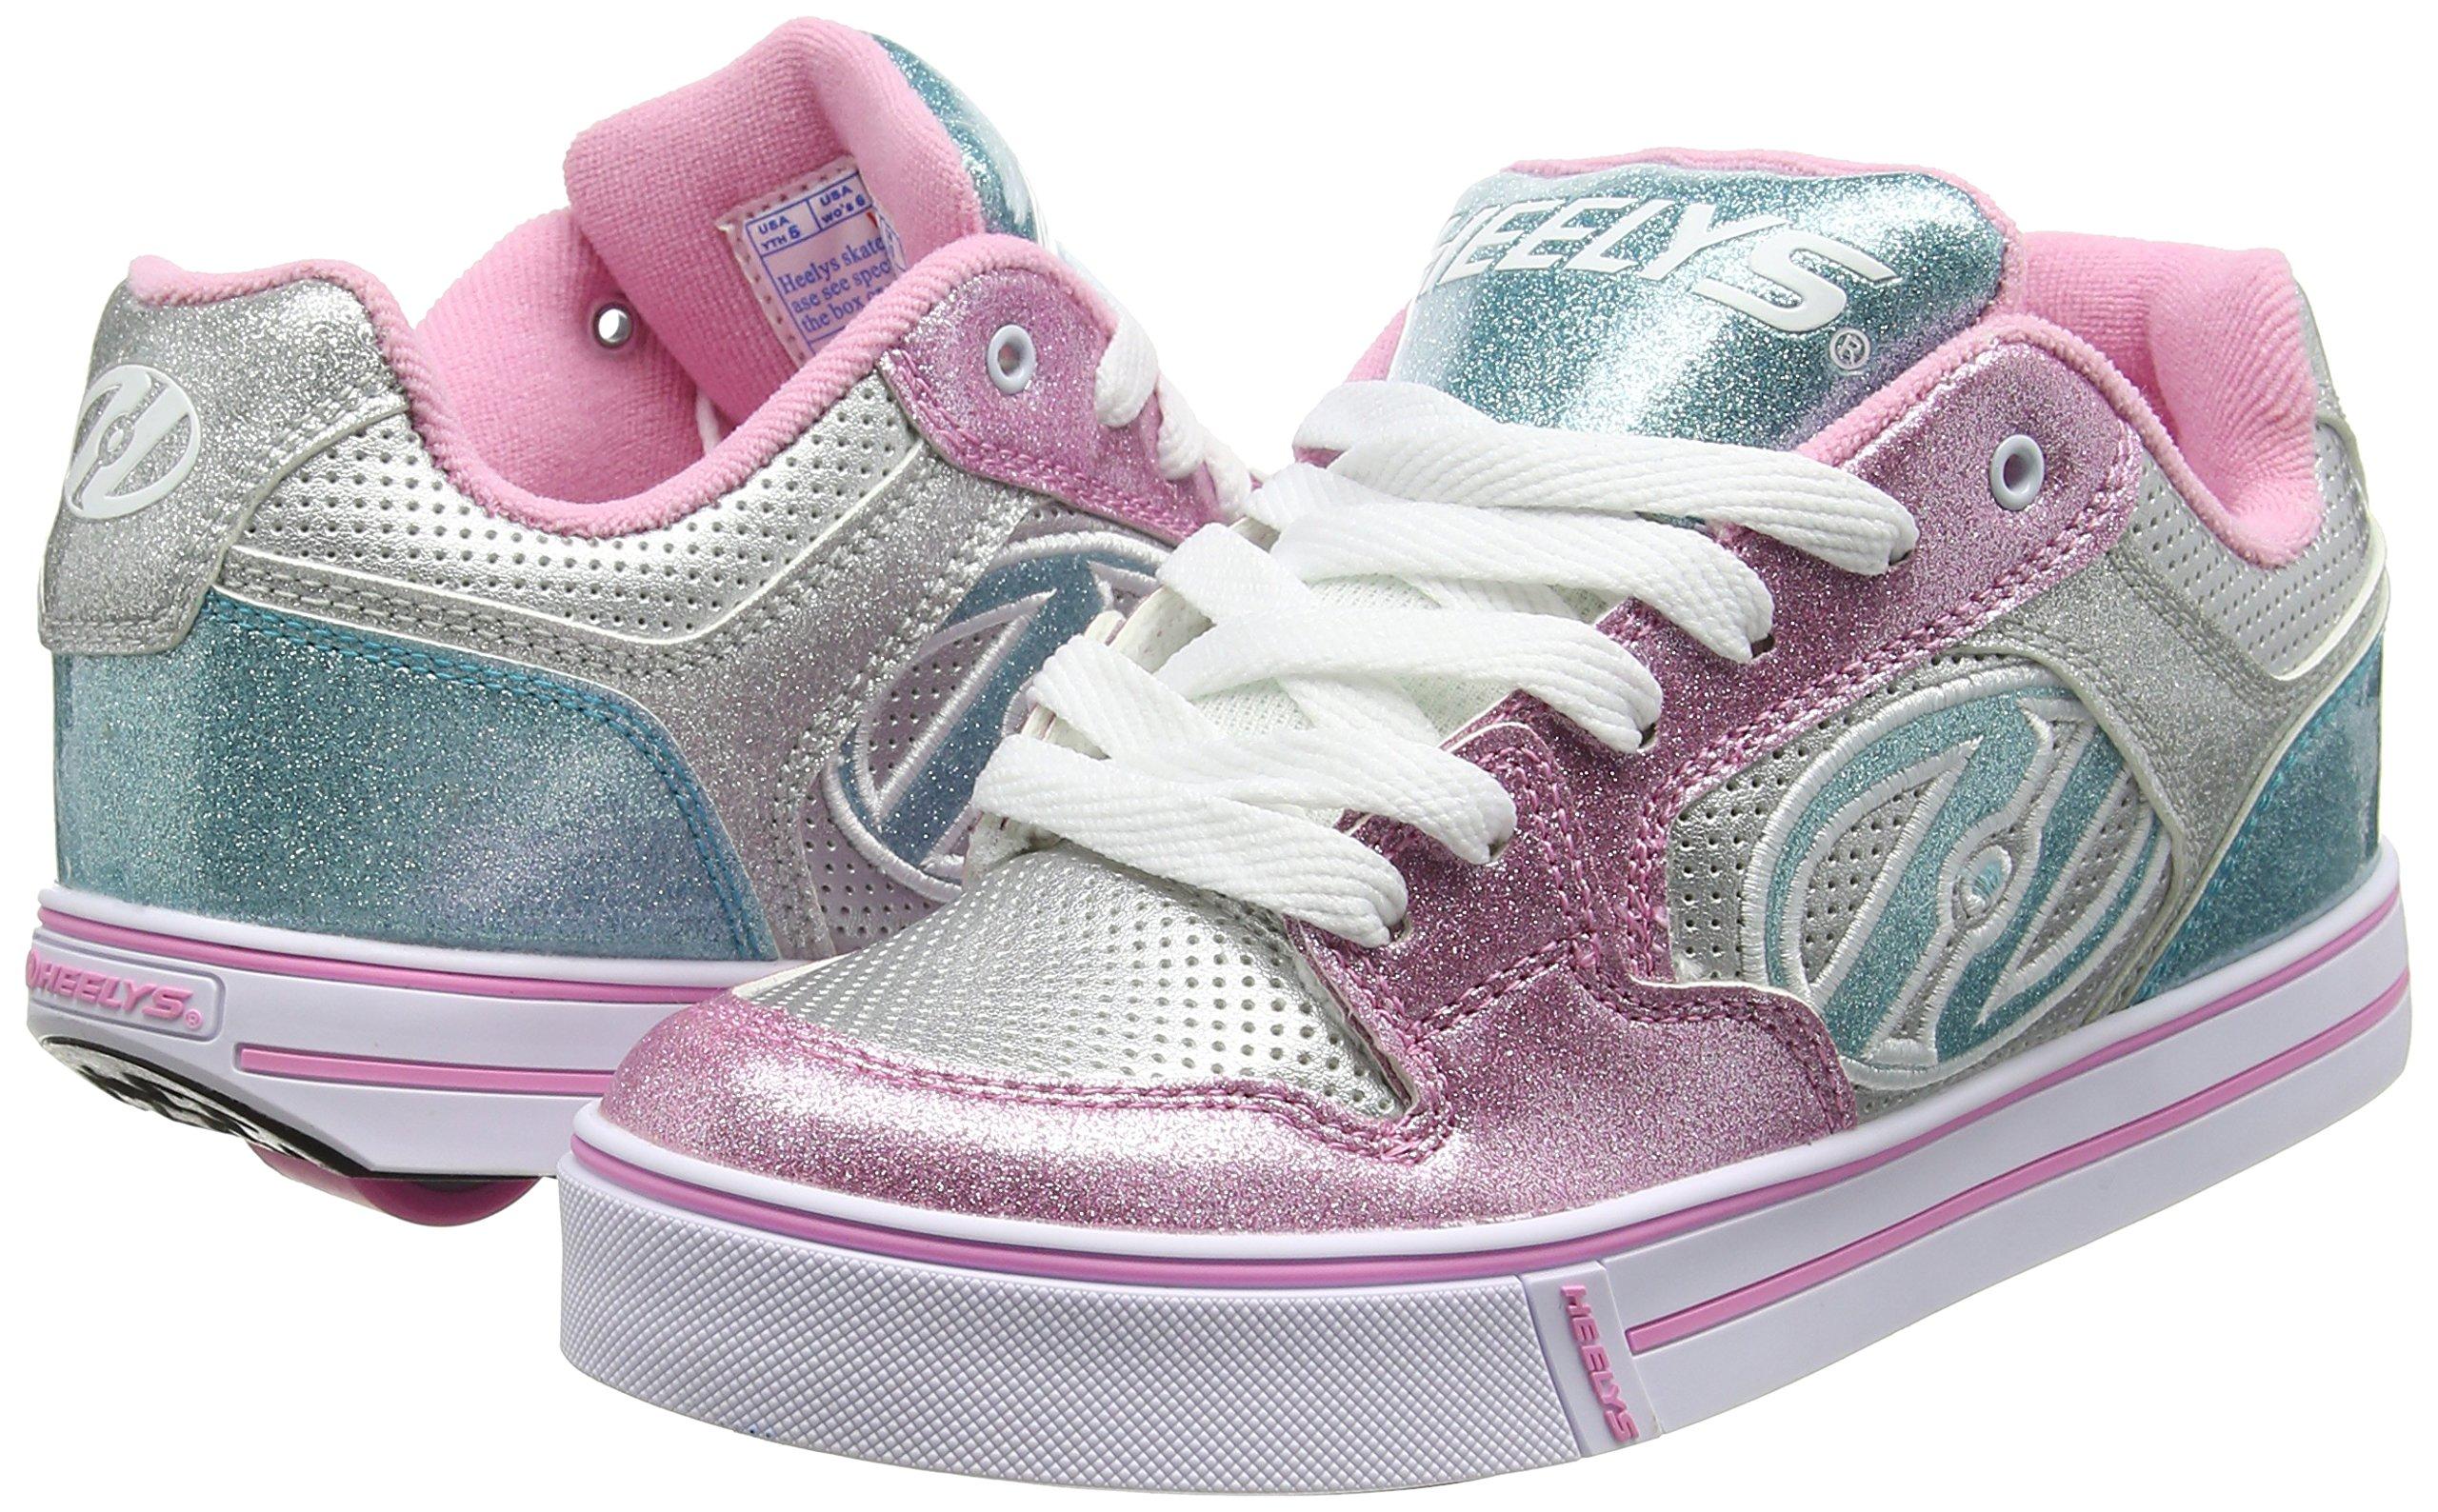 Heelys Girl's Motion Plus (Little Kid/Big Kid/Adult) Silver/Pink/Blue/Glitter Shoe by Heelys (Image #5)